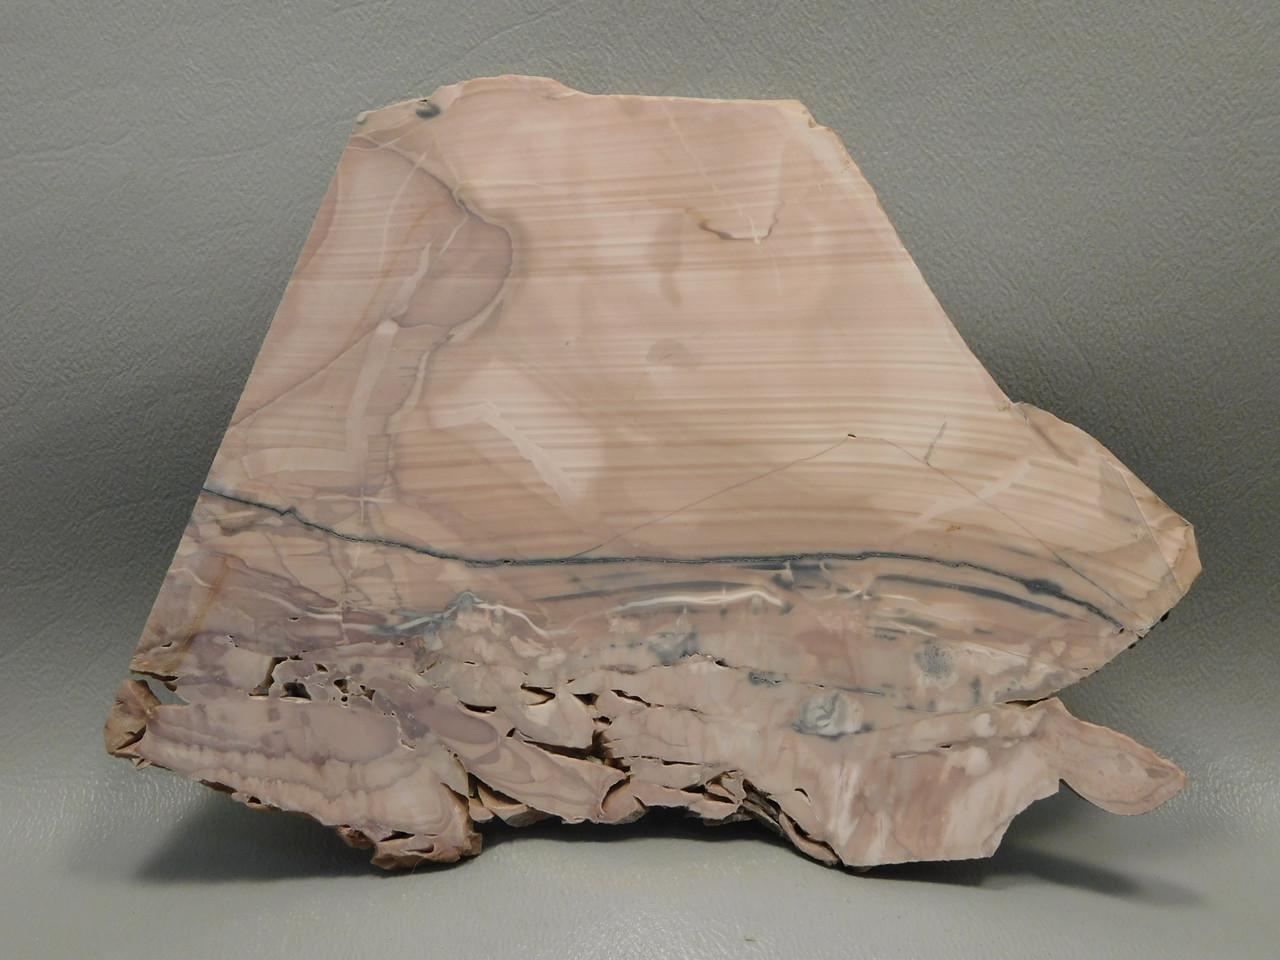 Willow Creek Picture Jasper Rough Rock Stone Slab Lapidary Idaho #O2